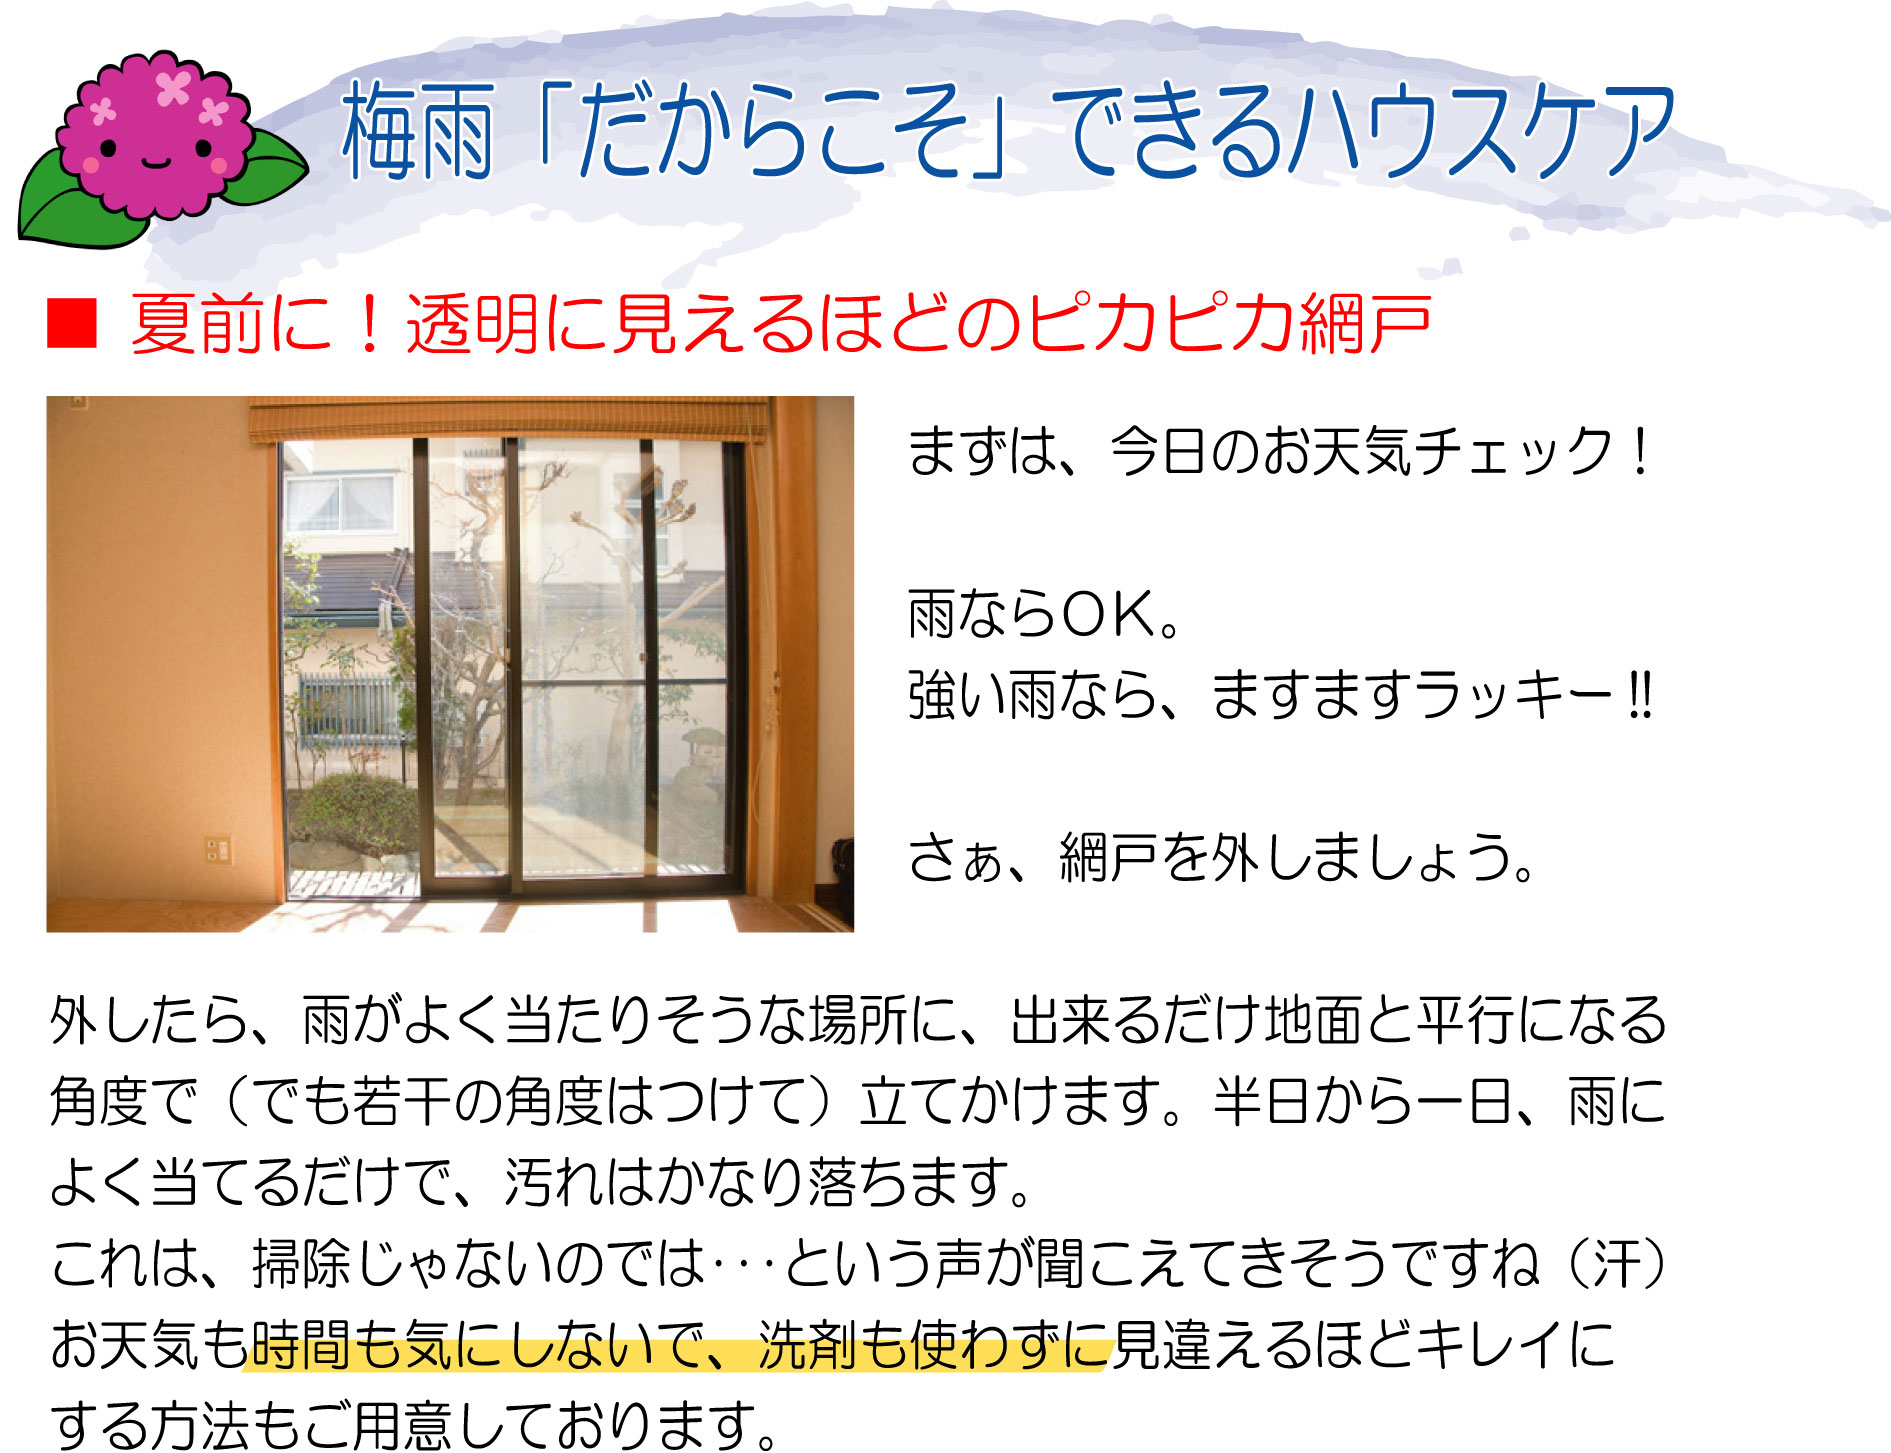 KuraSi-natu-sin73-11.jpg